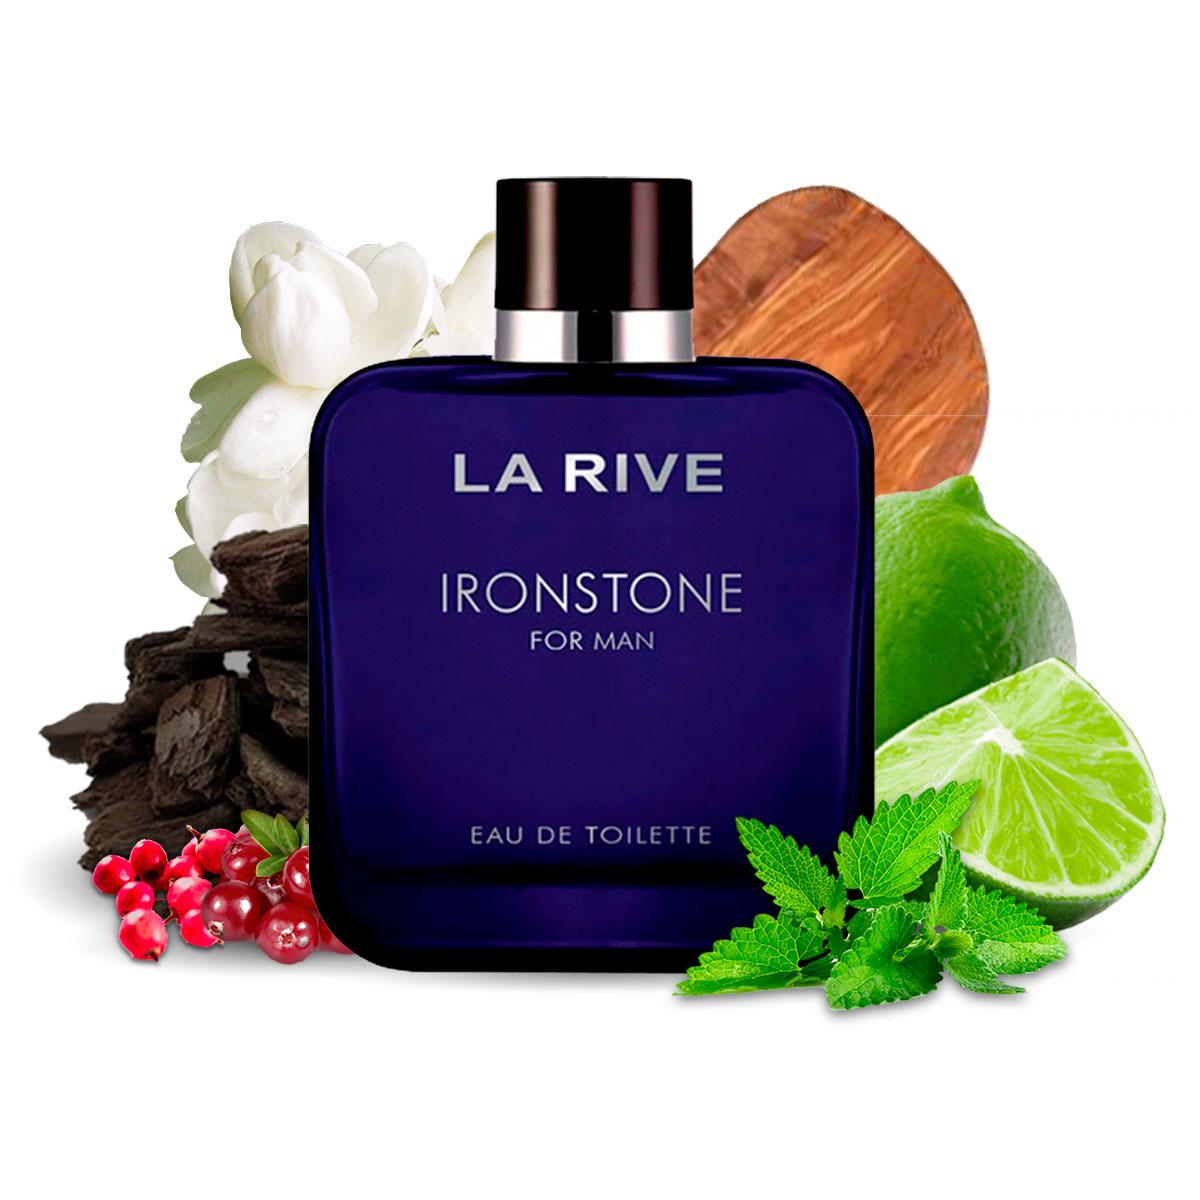 Kit 2 Perfumes Importados My Only Wish e Ironstone La Rive